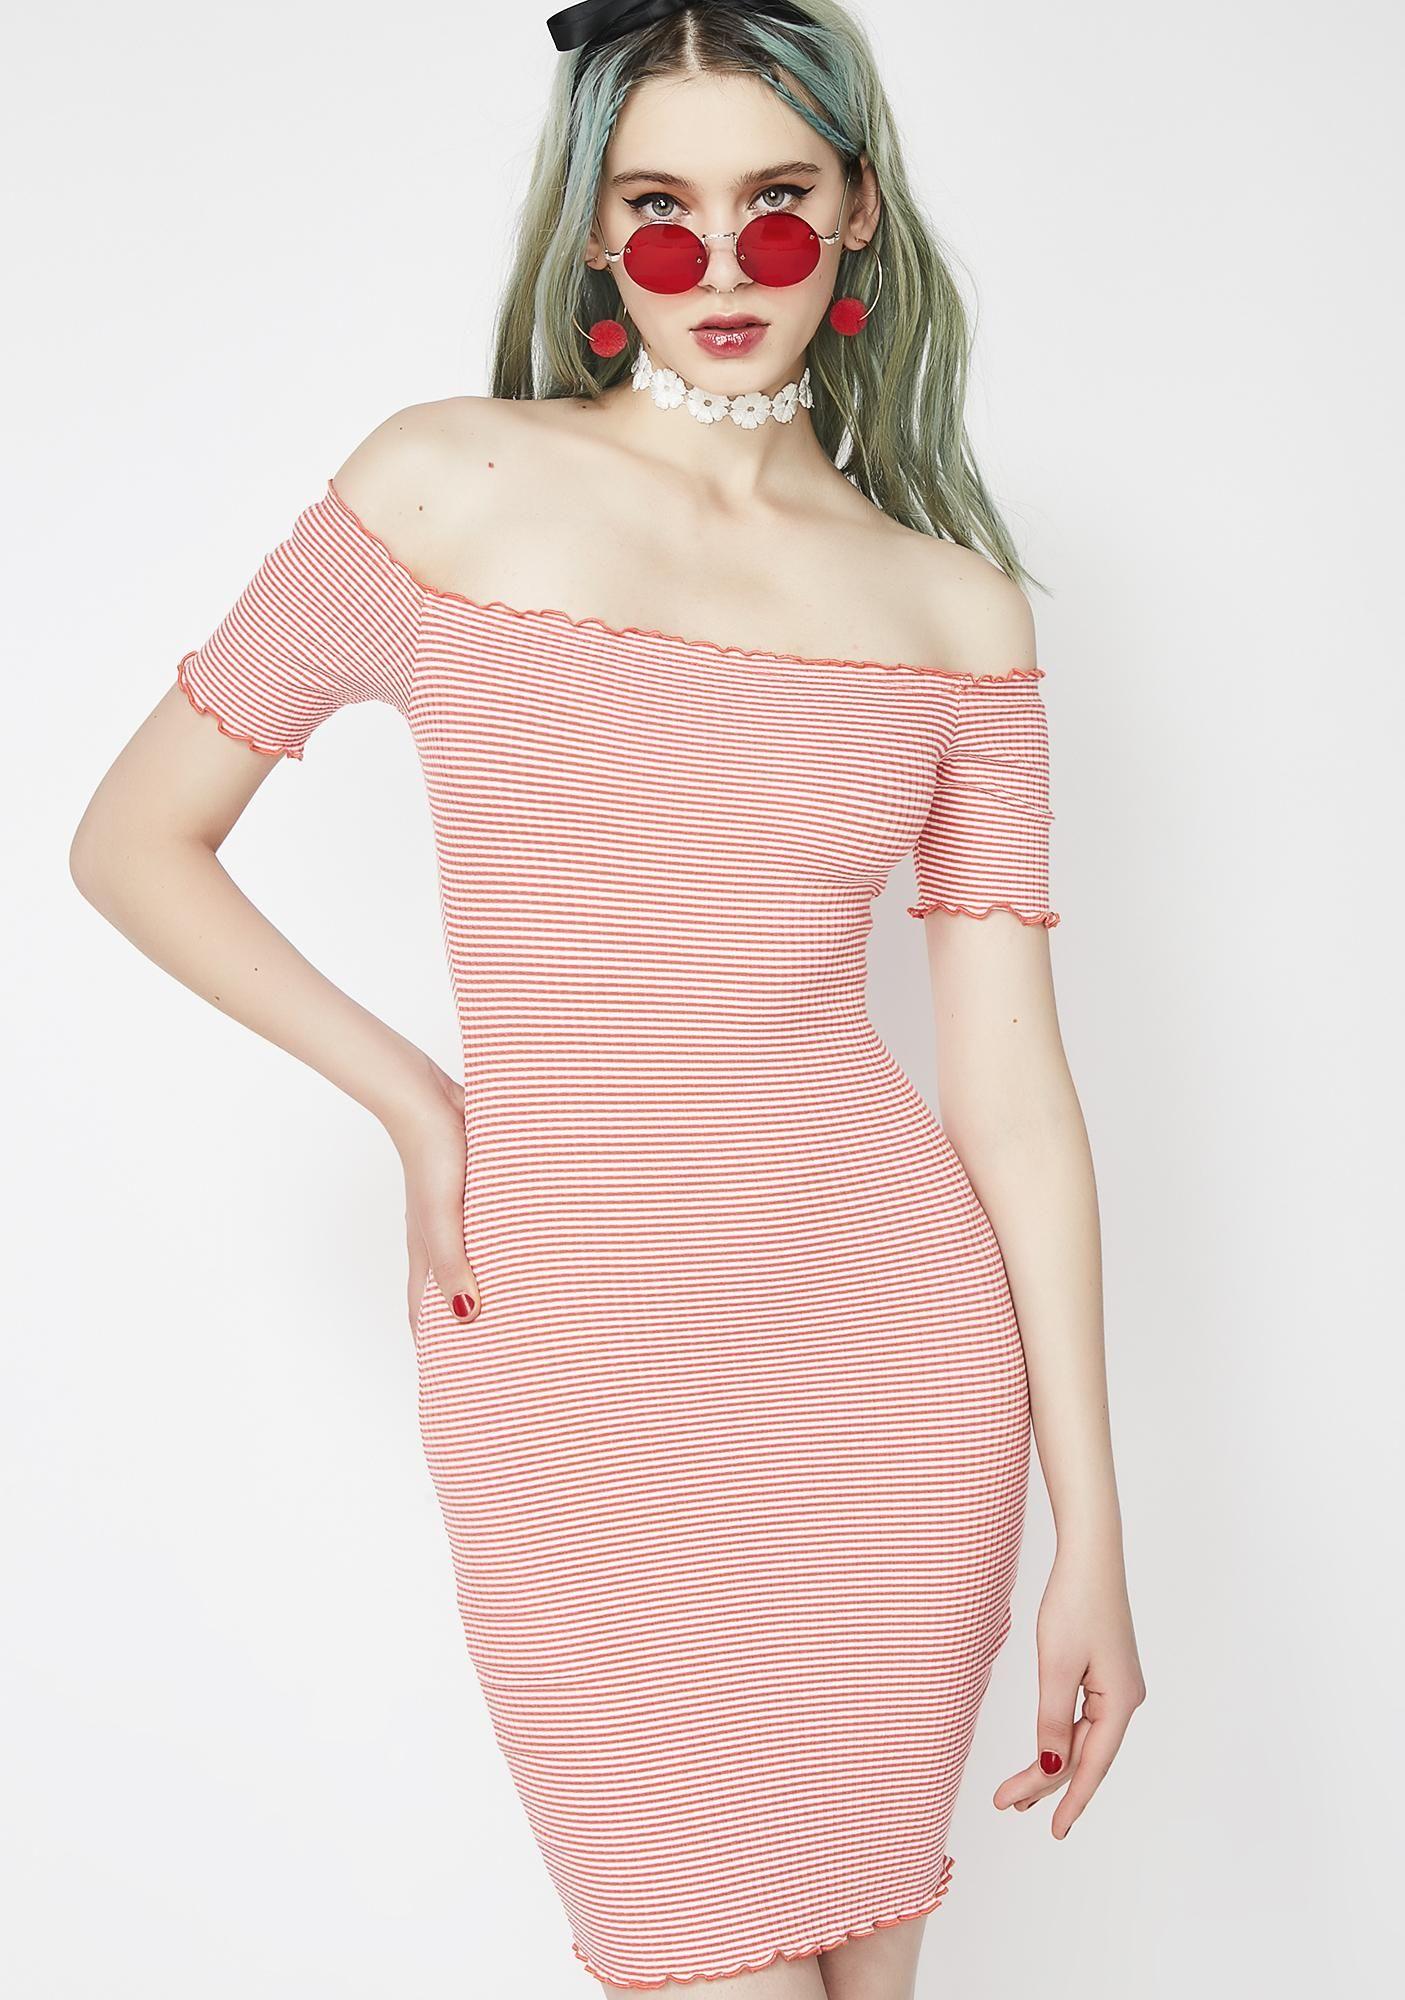 Sweet Candy Stripe Dress Candy Stripe Dress Tight Party Dresses Striped Bodycon Dress [ 2000 x 1405 Pixel ]